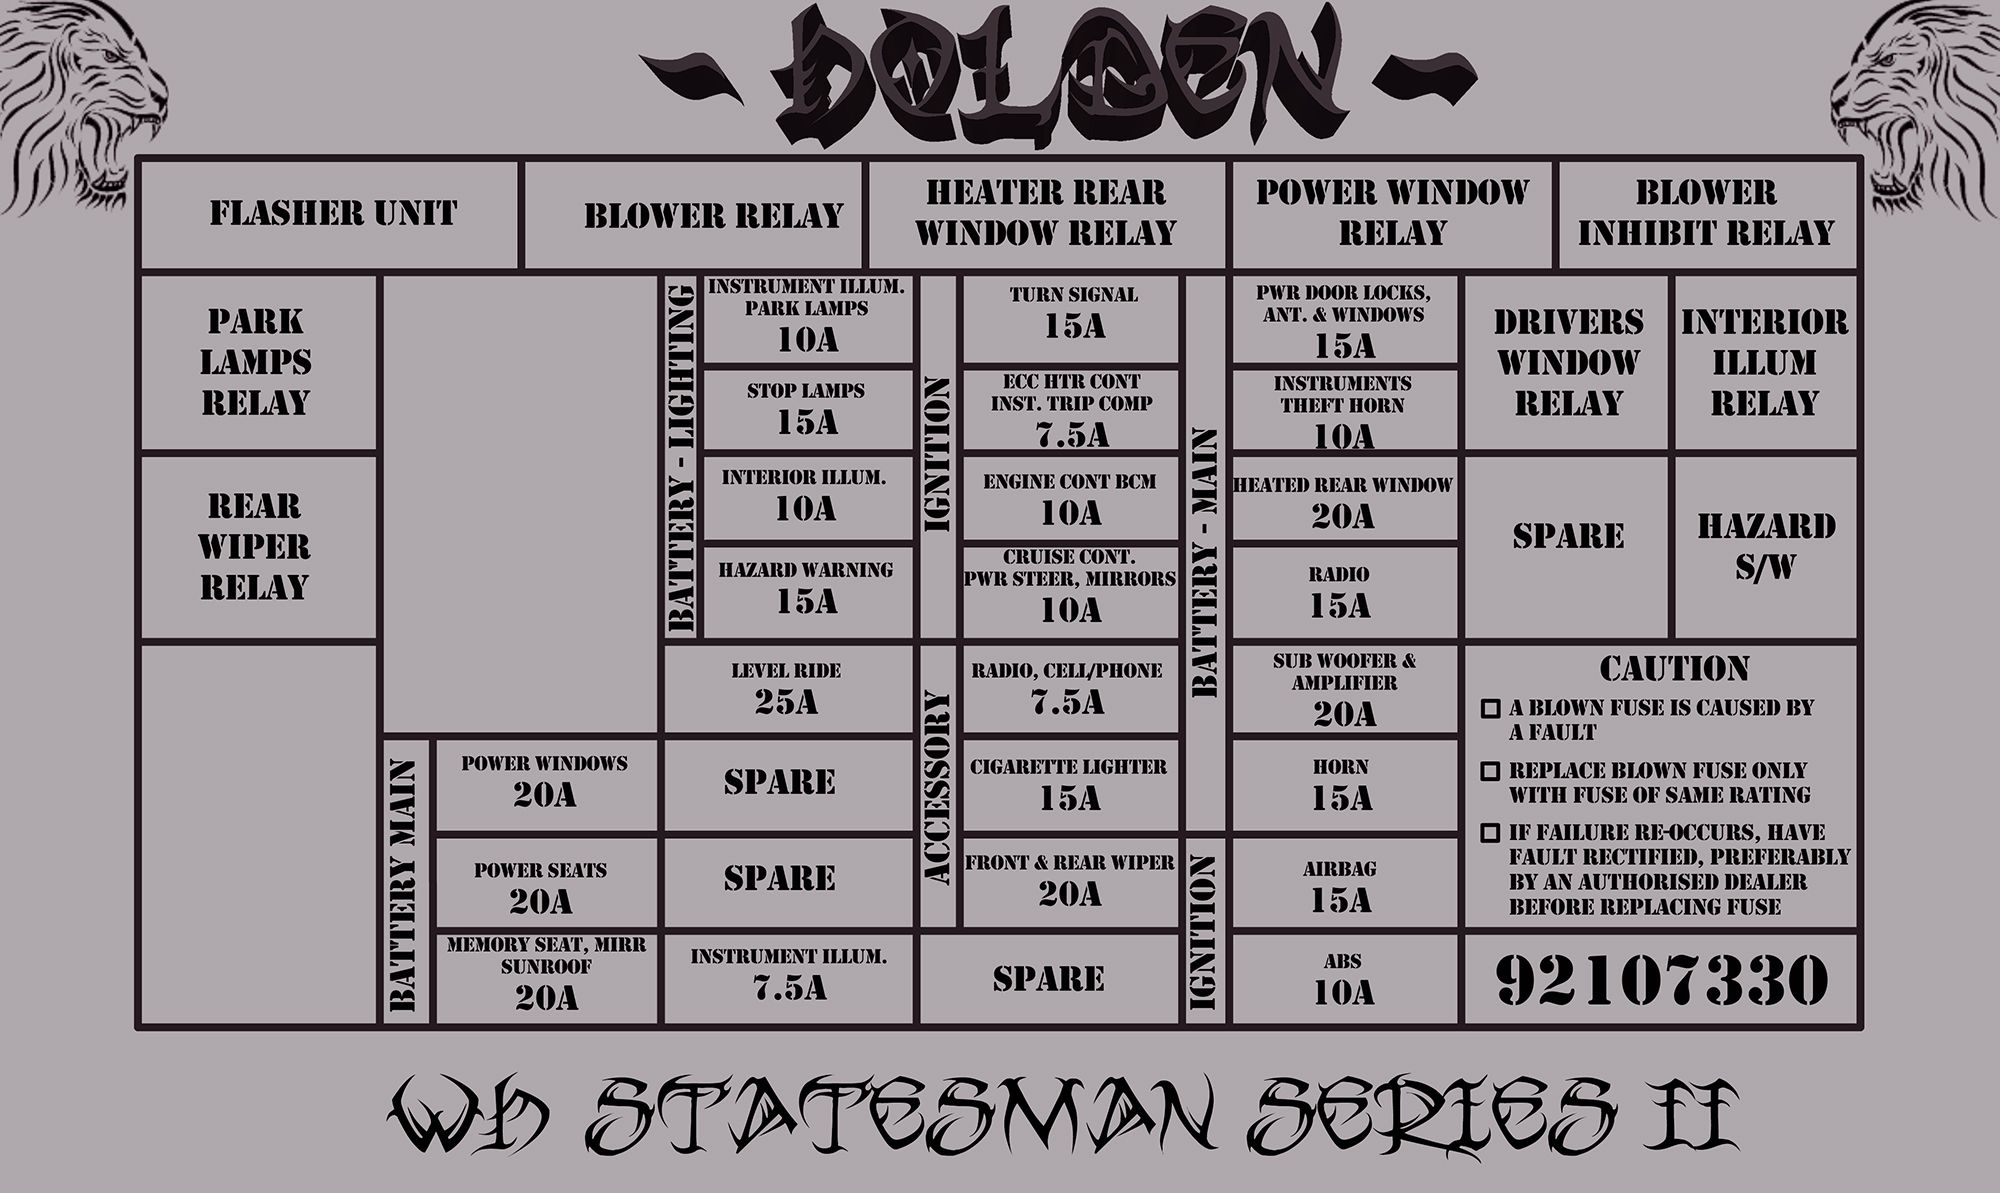 2002 wh statesman series ii under dash fuse relay diagram [ 2000 x 1193 Pixel ]